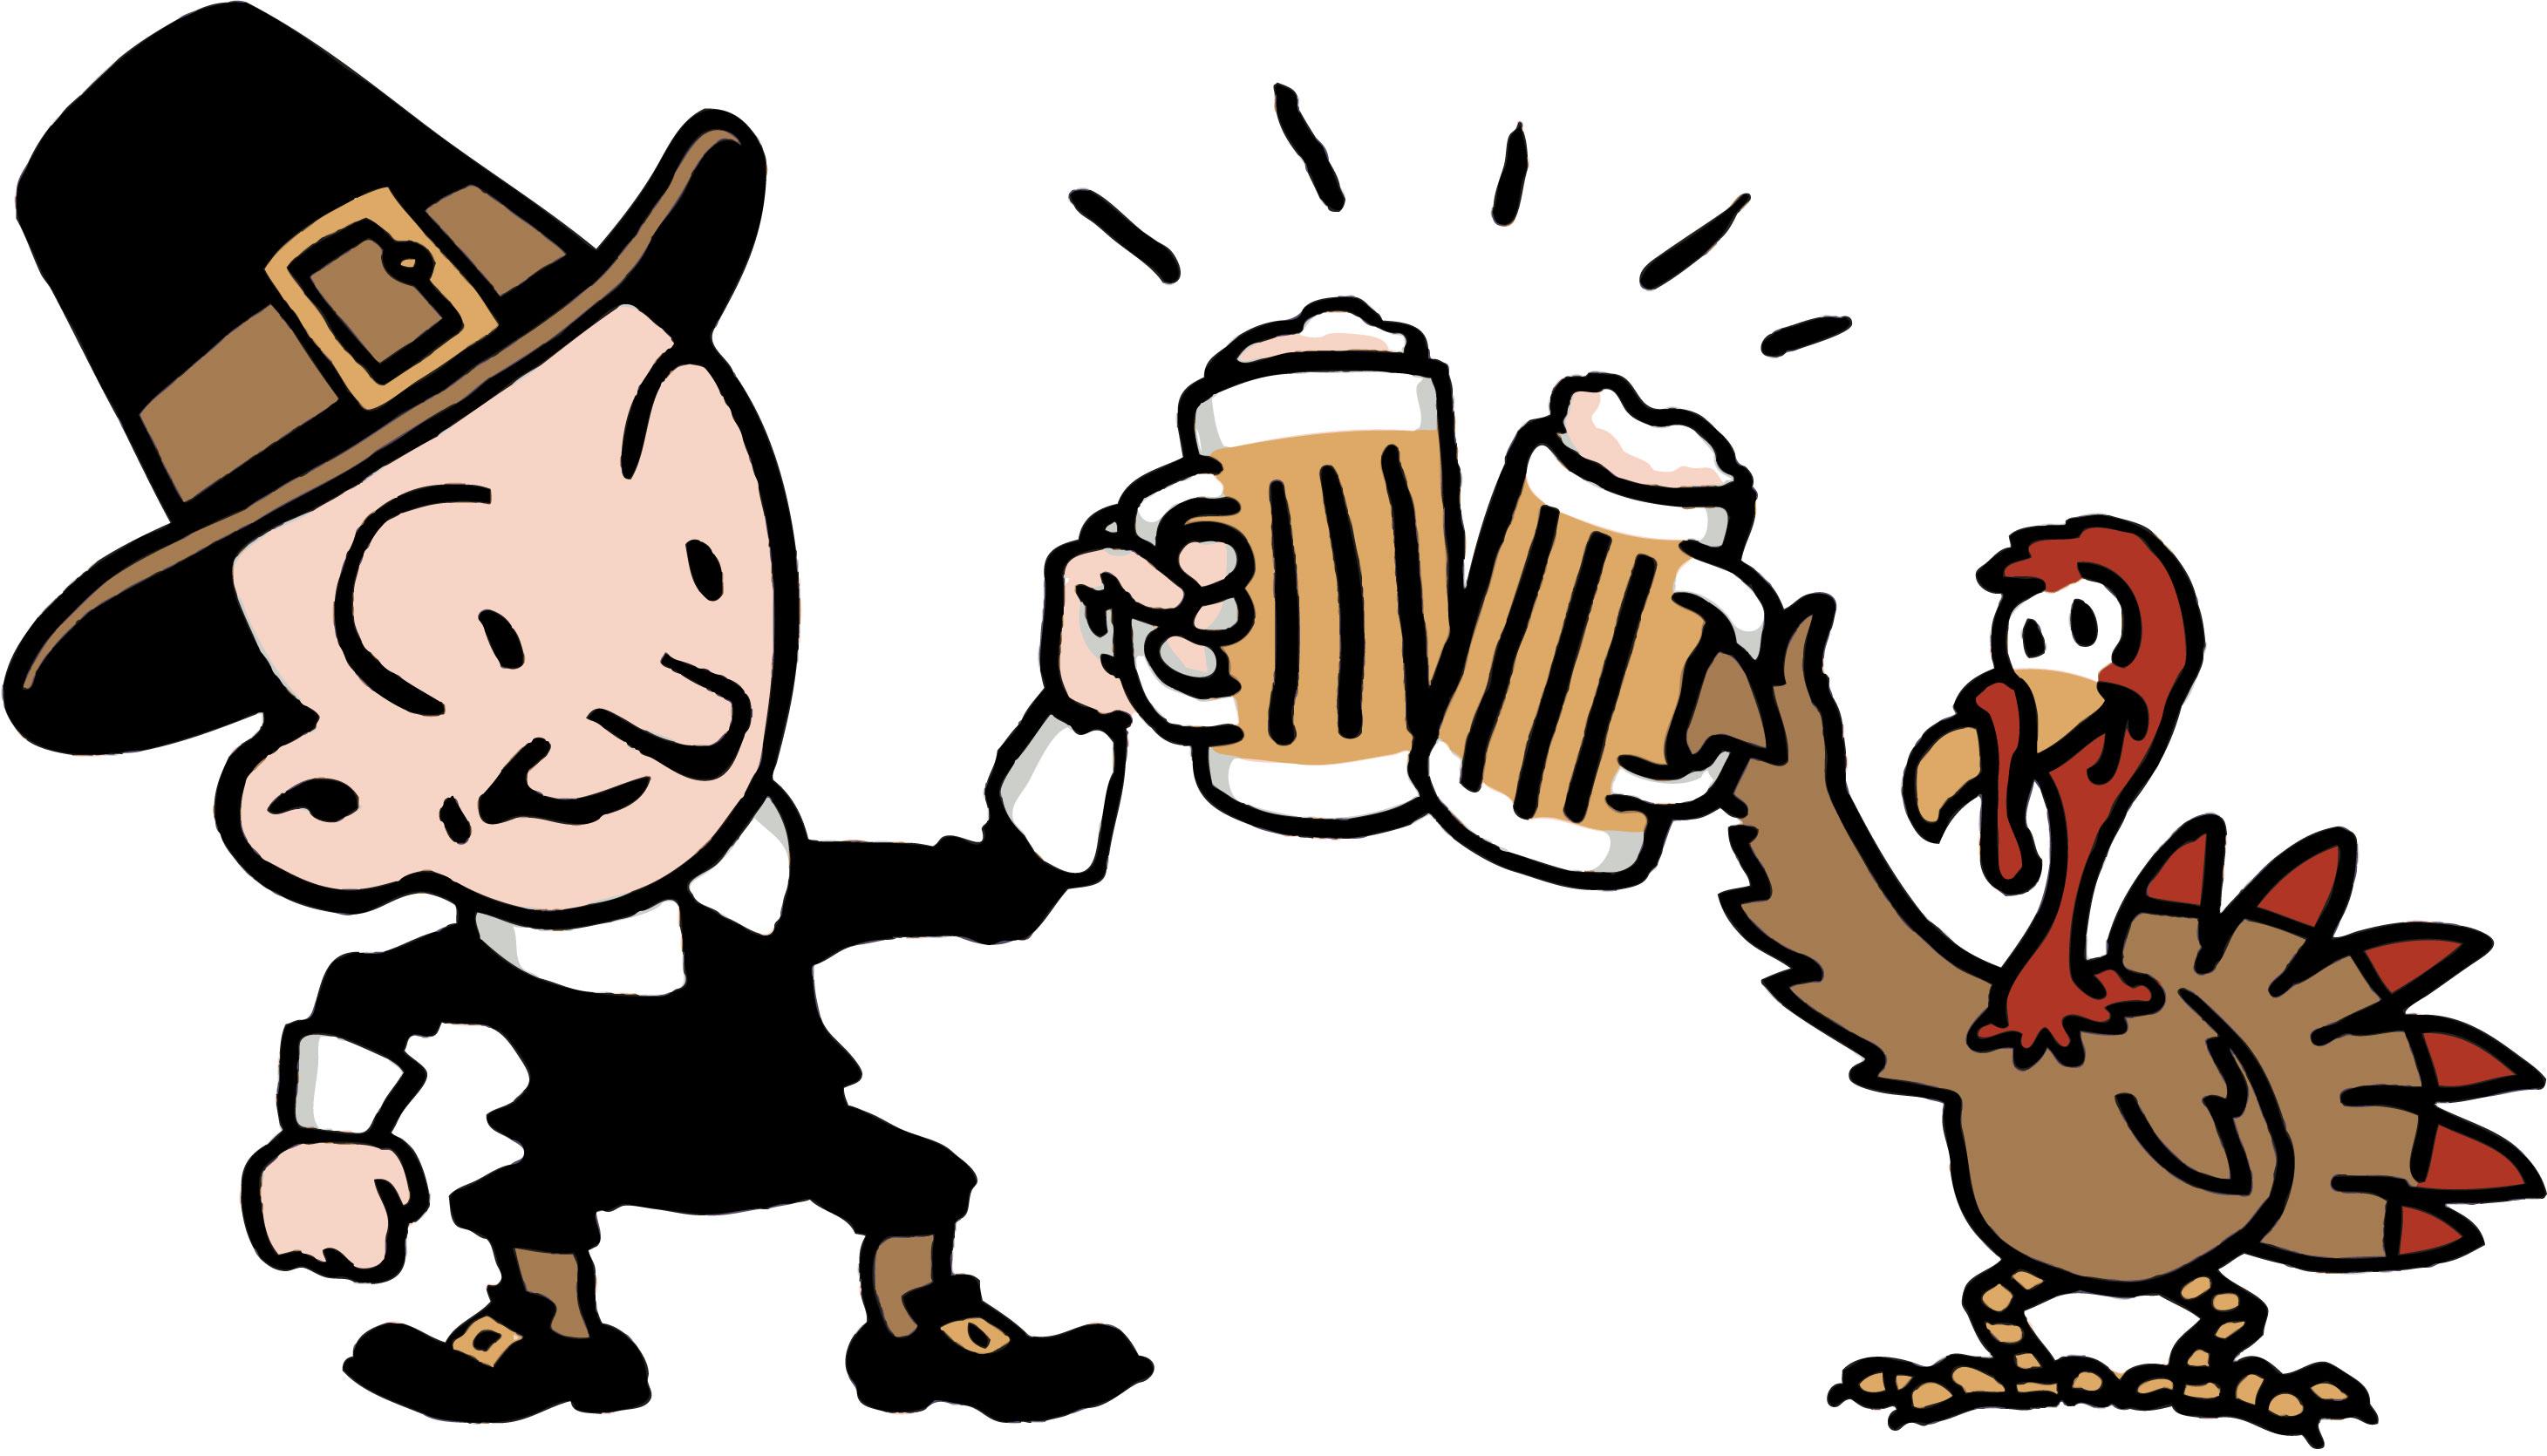 Thanksgiving 2013 Pairing Guide – Boulevard Brewing pany